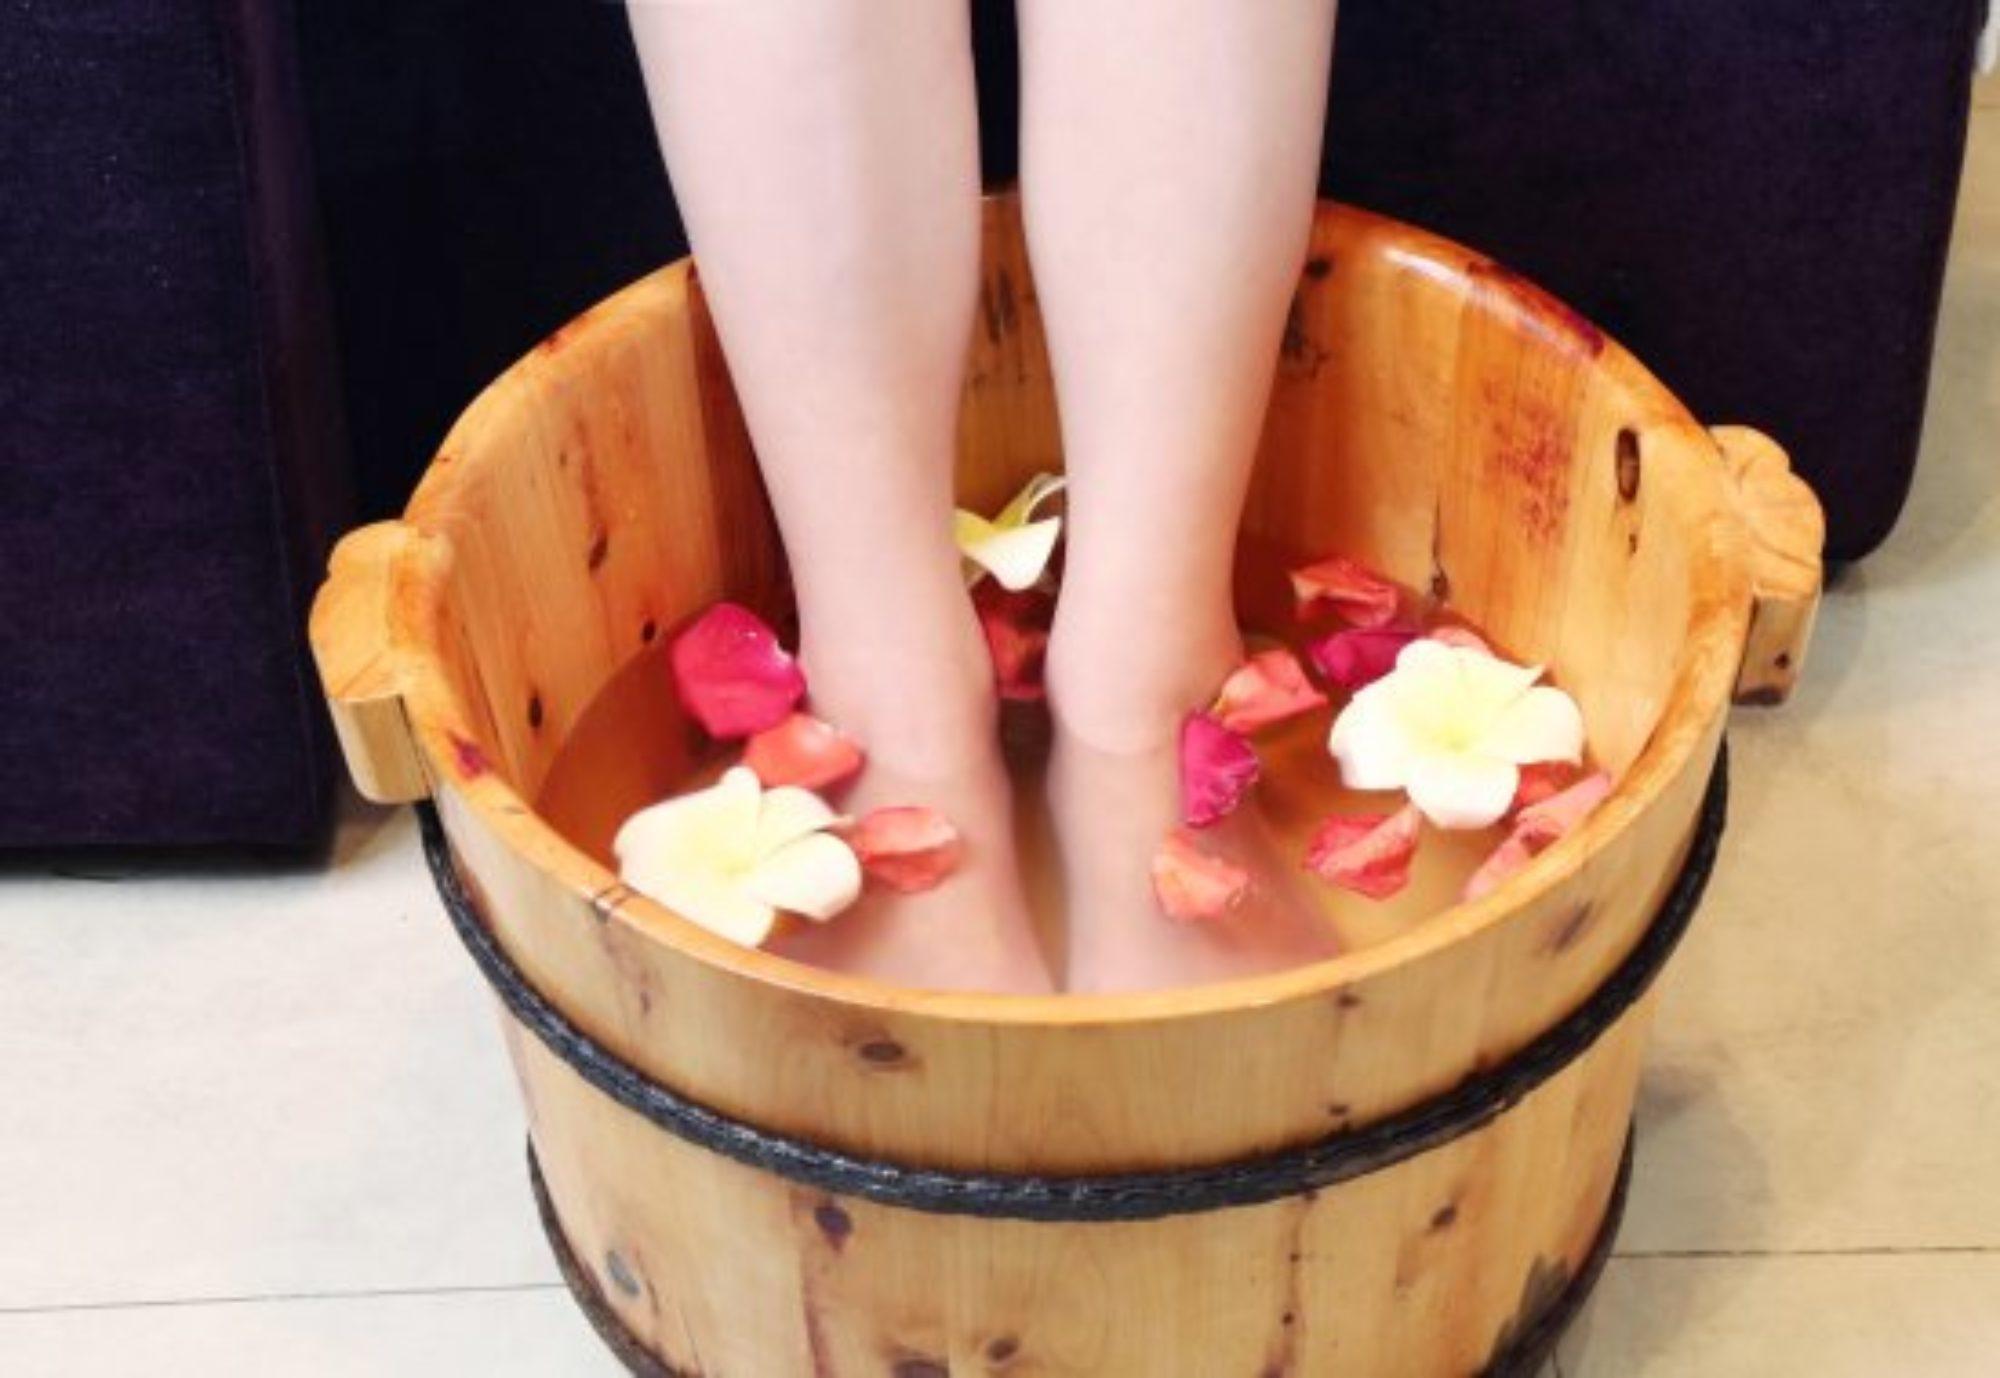 Lighten Up - Ion Detox Foot Bath & More